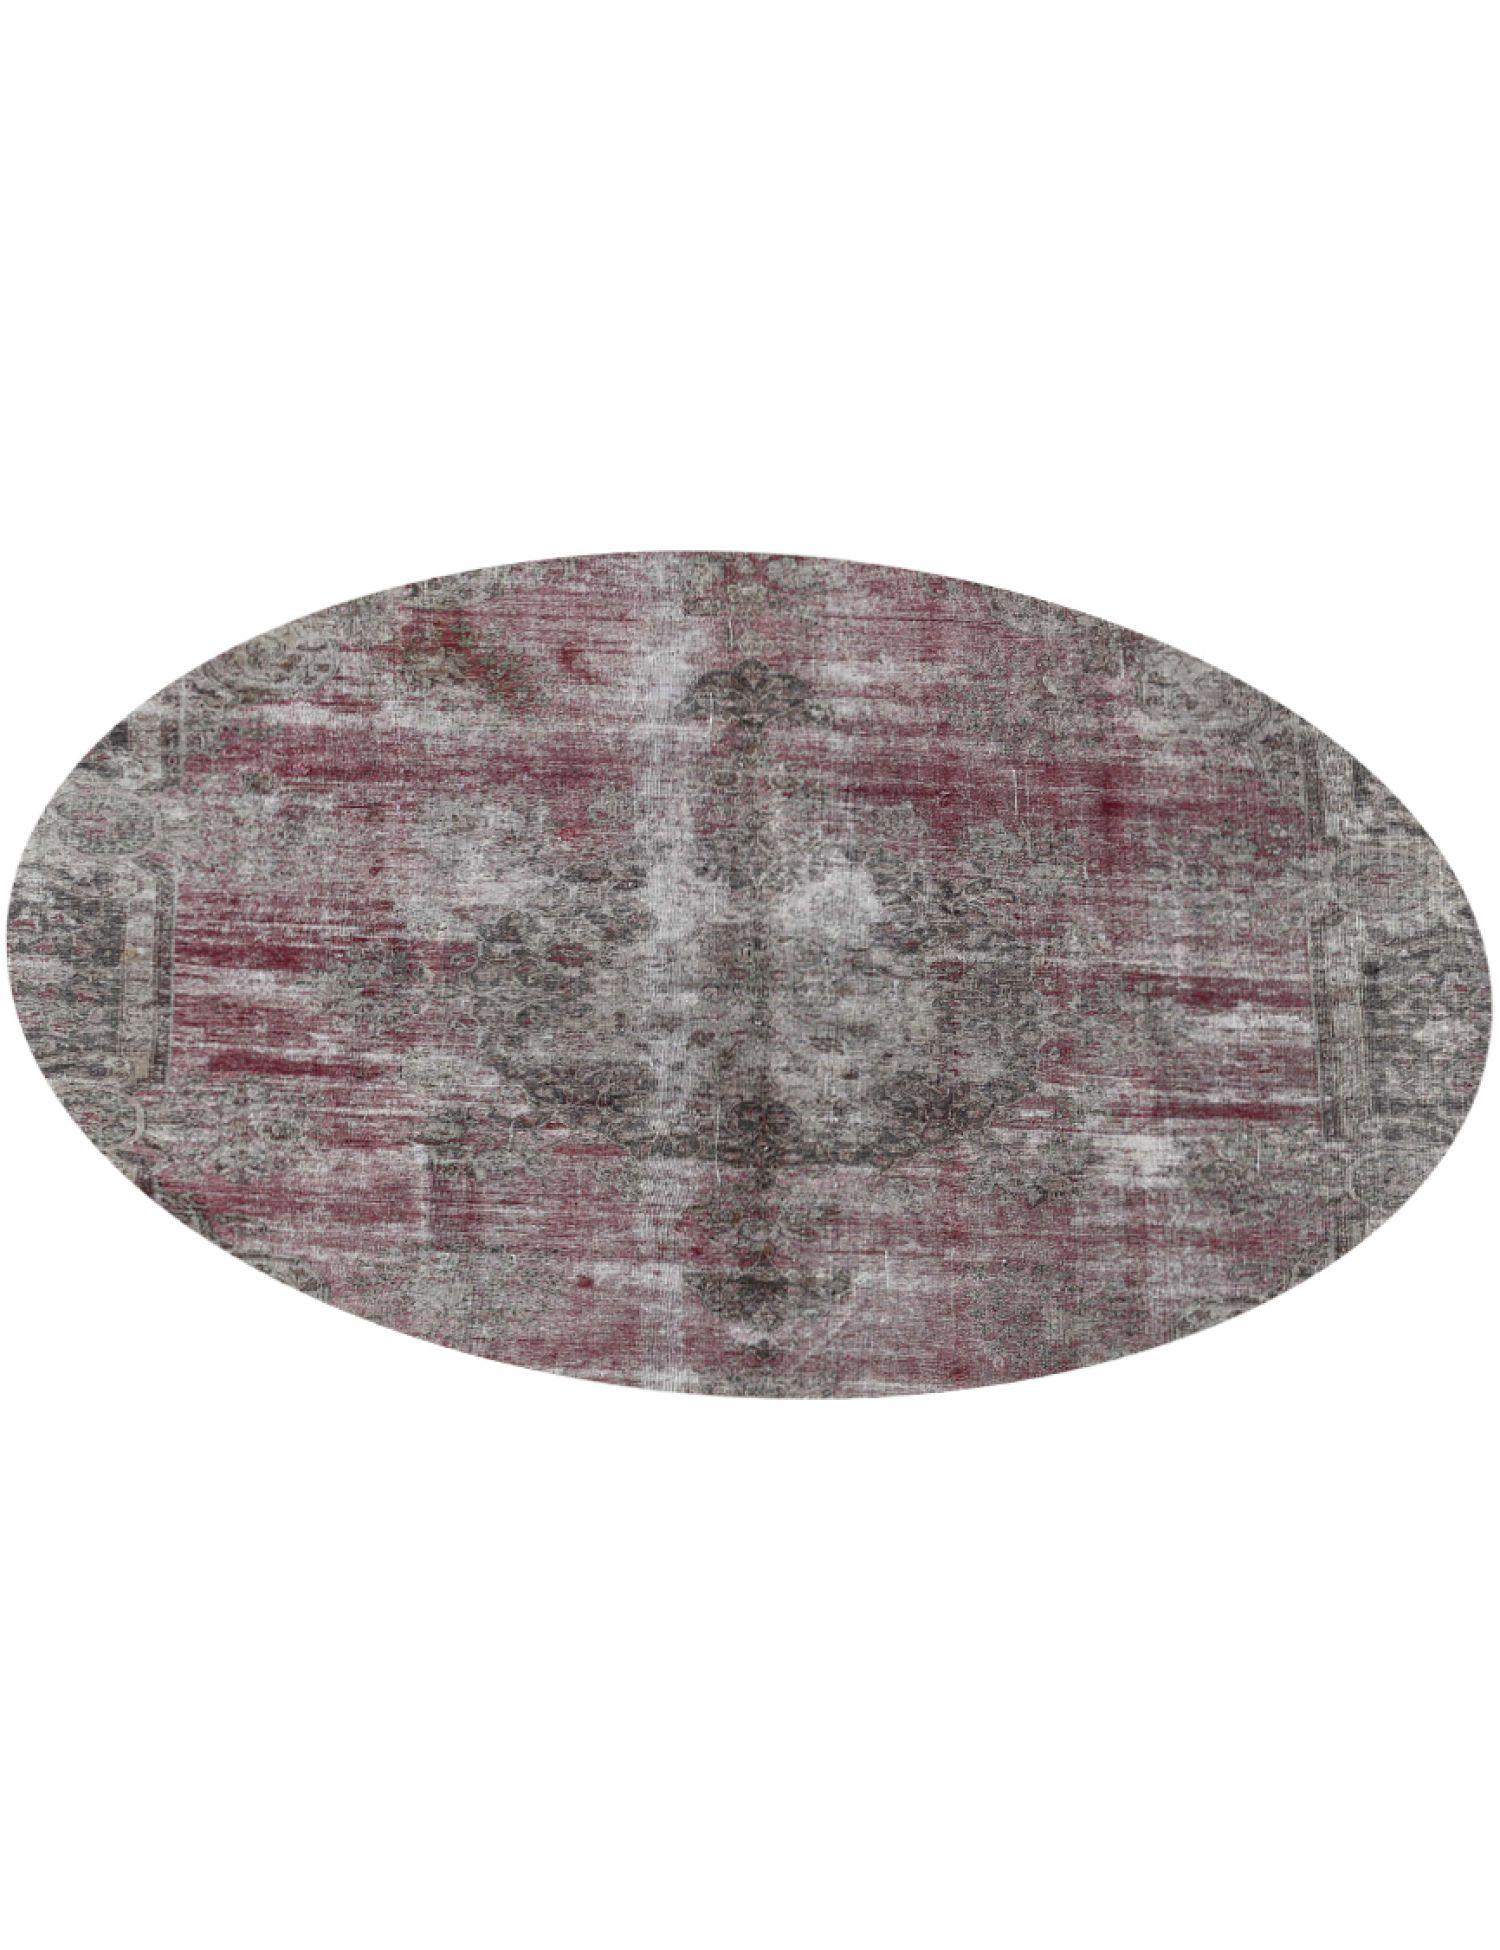 Tappeto Vintage  viola <br/>258 x 258 cm